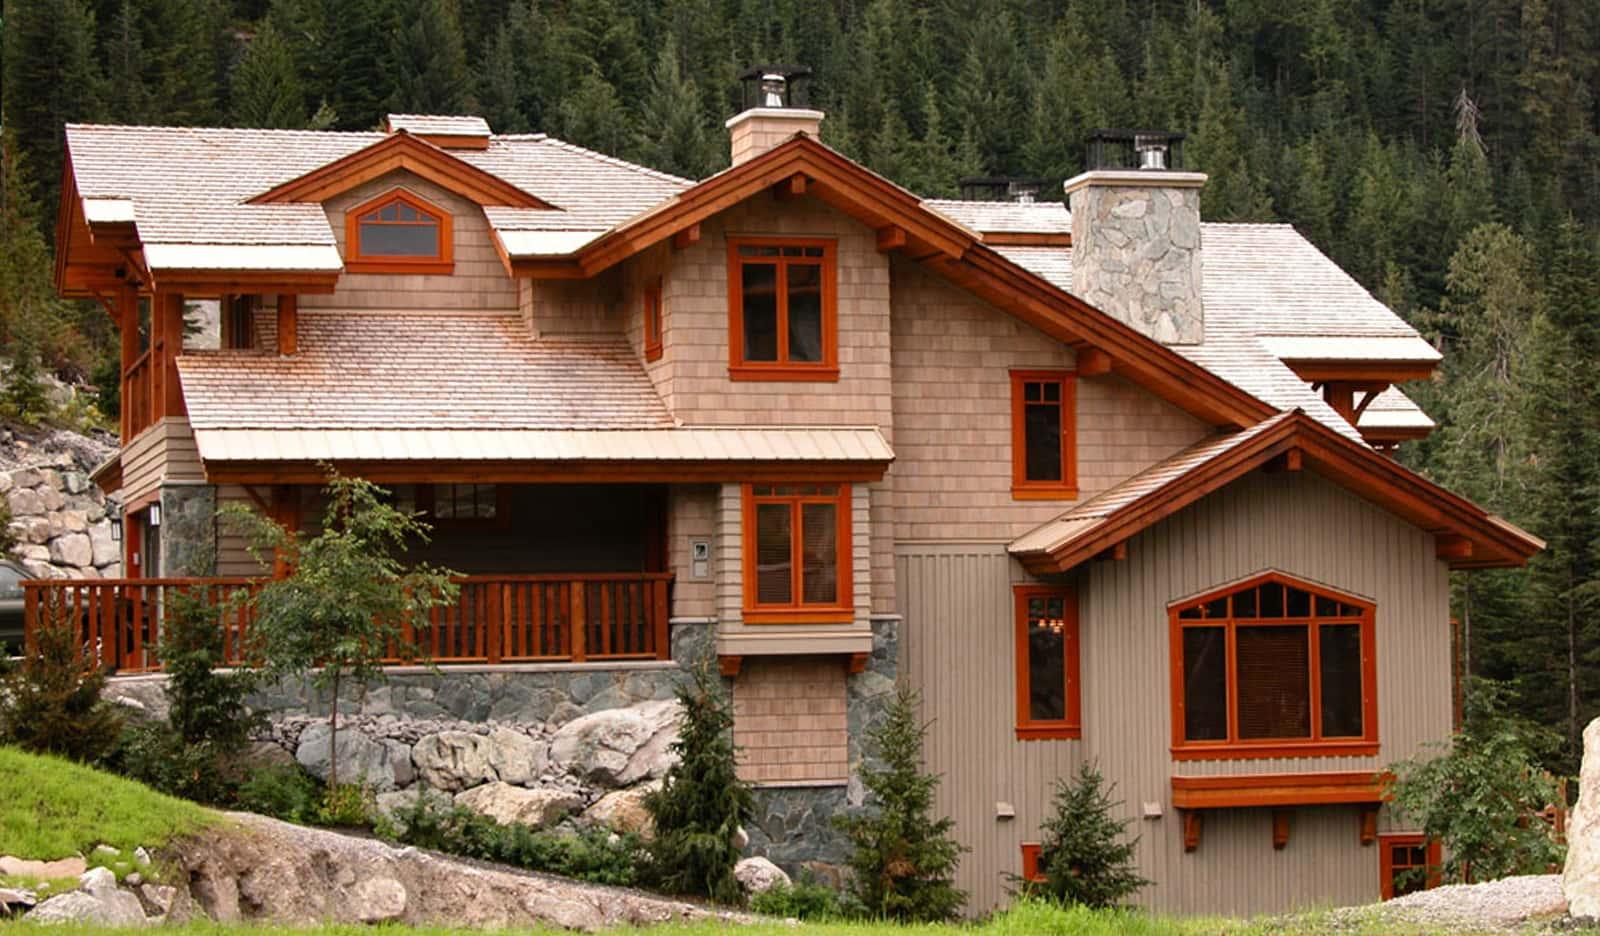 Watkins Sawmills Ltd Cedar Shingles Perfection #1 Grade House